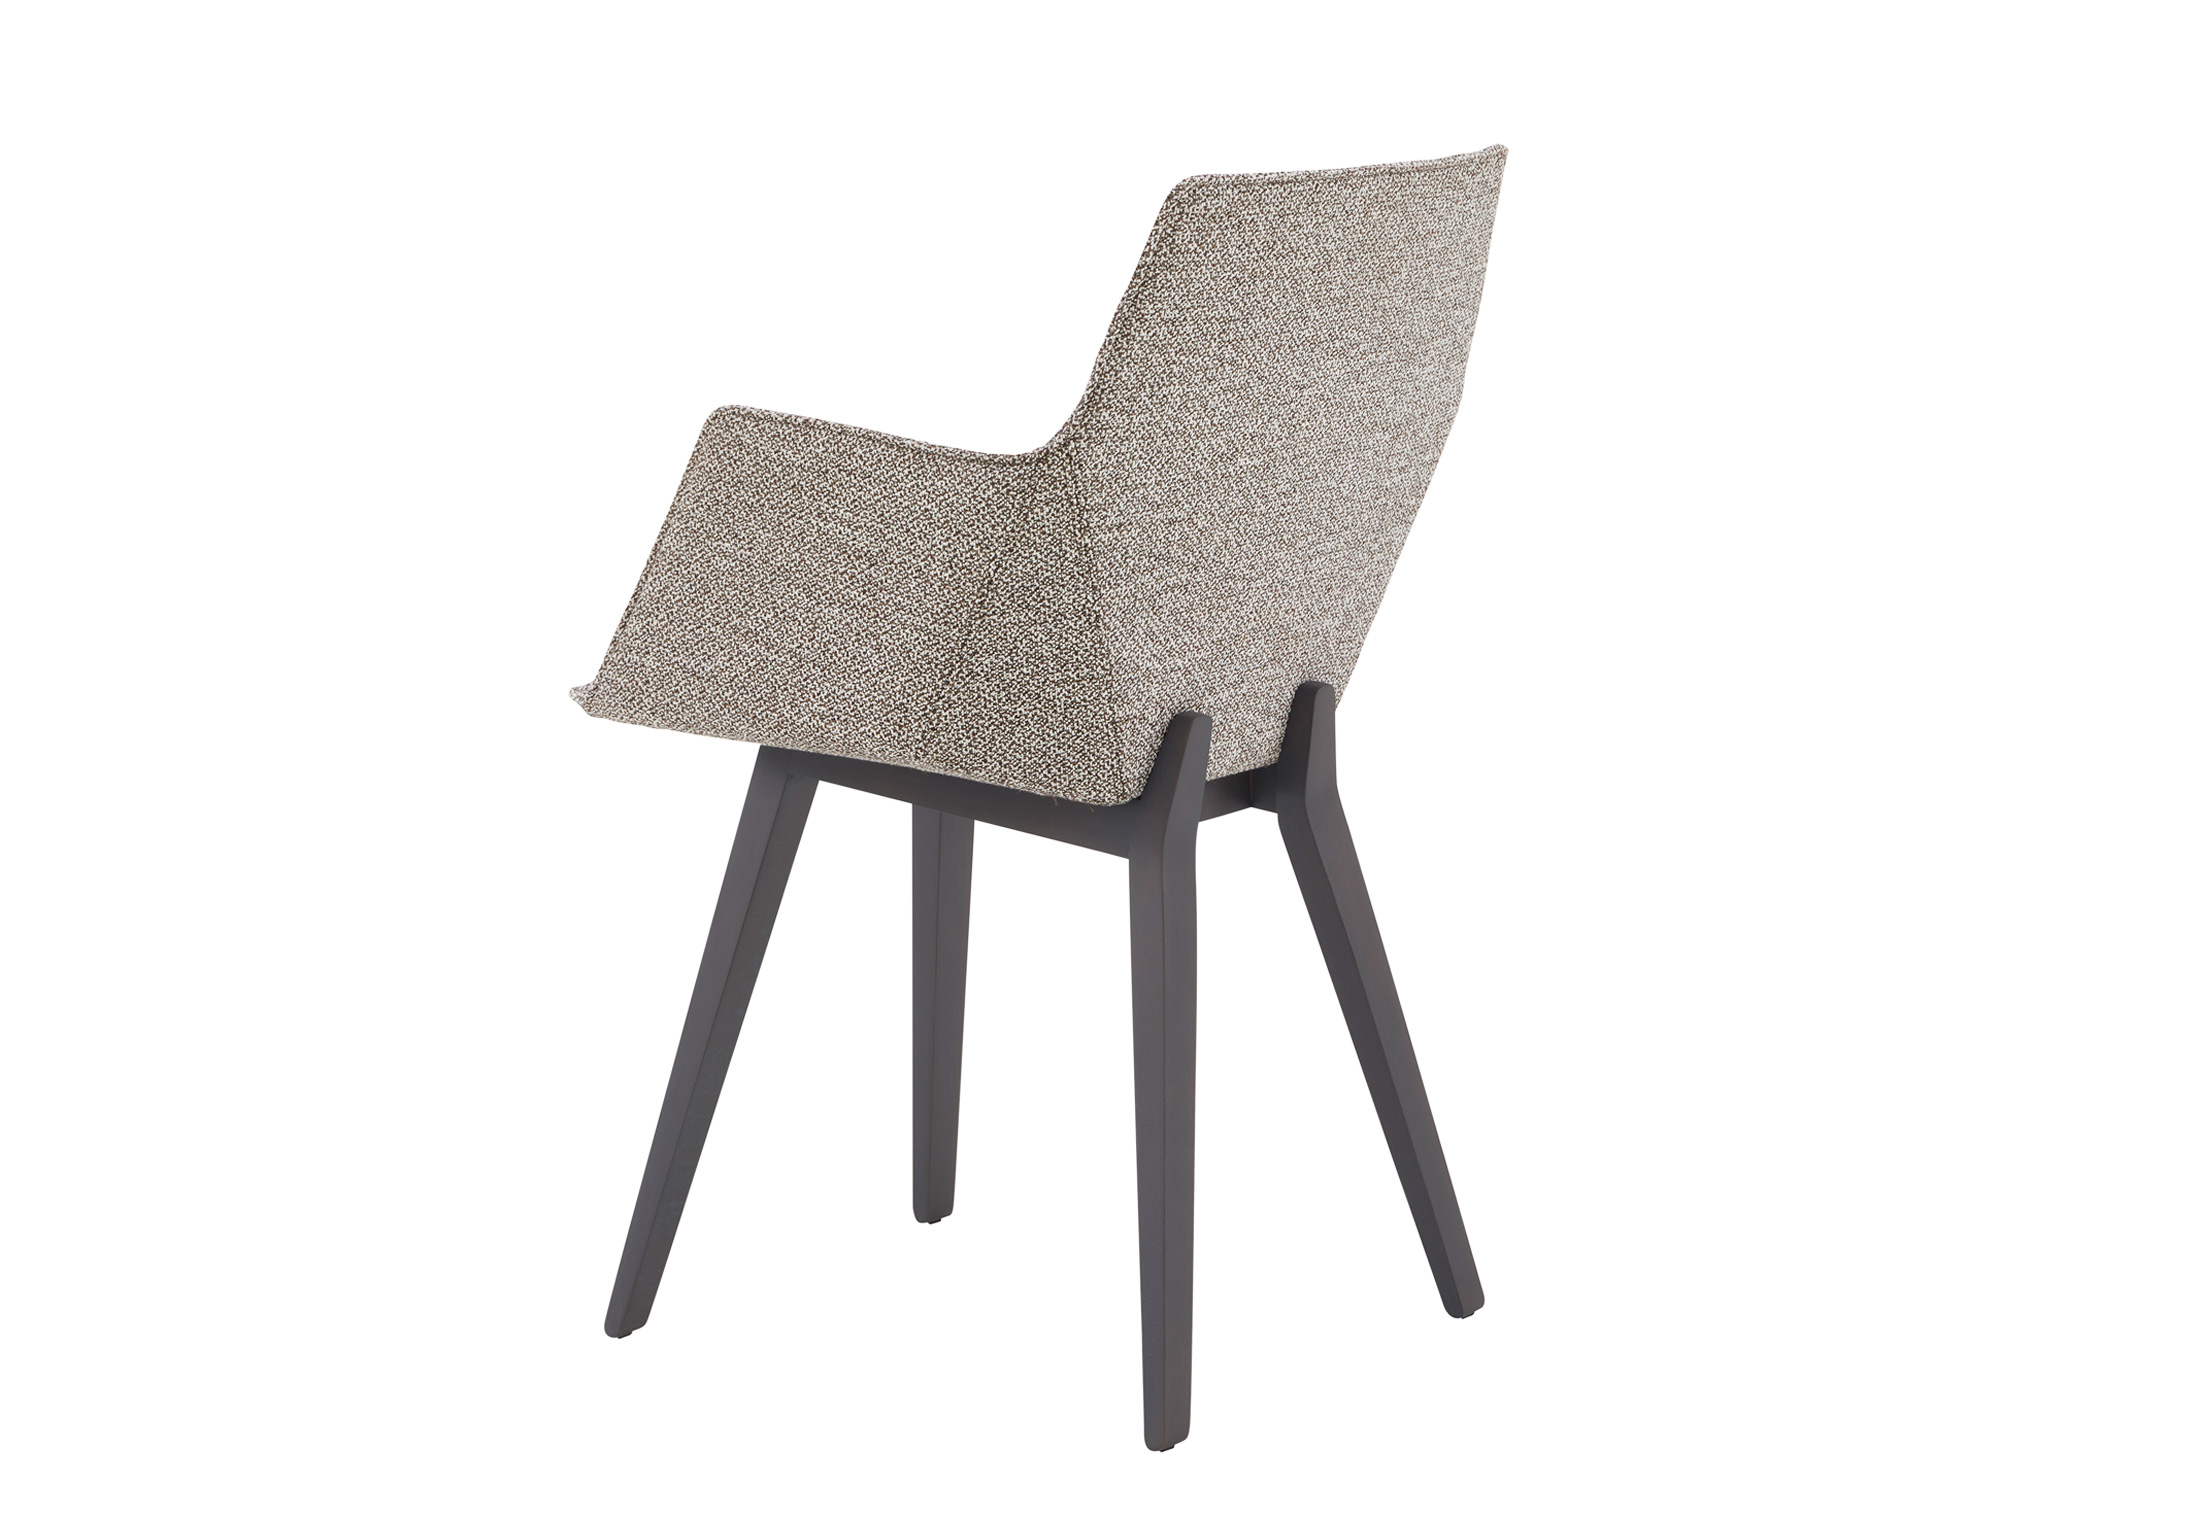 elsa bridge with wooden legs by ligne roset stylepark. Black Bedroom Furniture Sets. Home Design Ideas